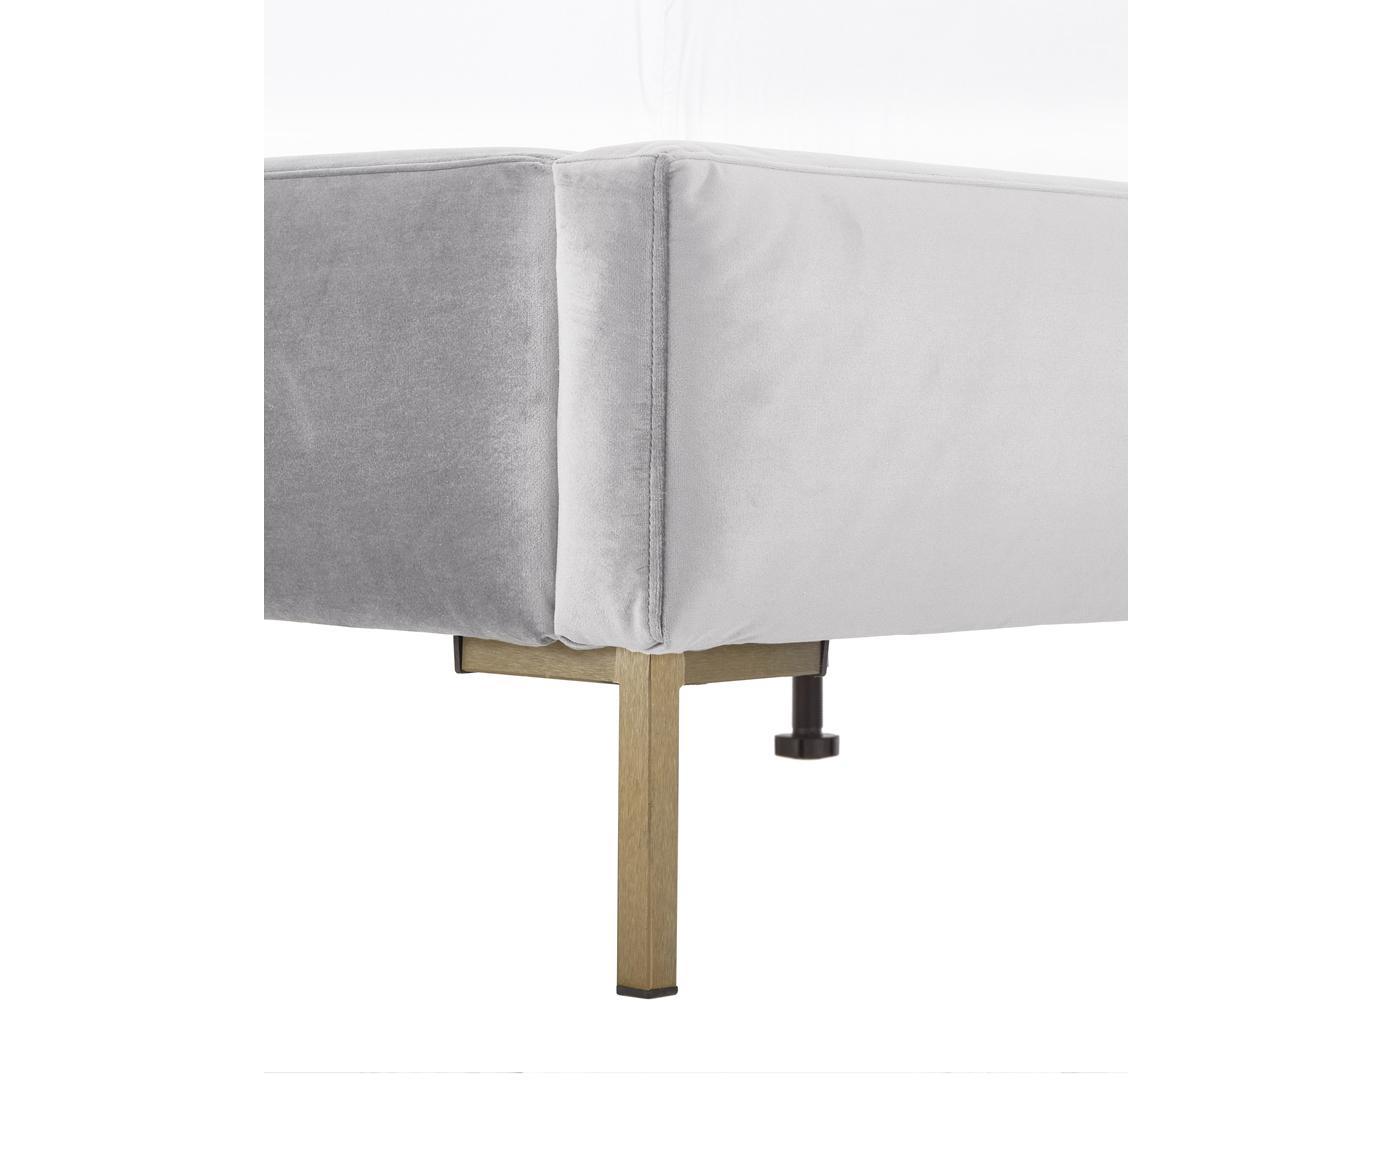 Samt-Polsterbett Peace, Korpus: Massives Kiefernholz, Füße: Metall, pulverbeschichtet, Bezug: Polyestersamt 30.000 Sche, Samt Hellgrau, 200 x 200 cm